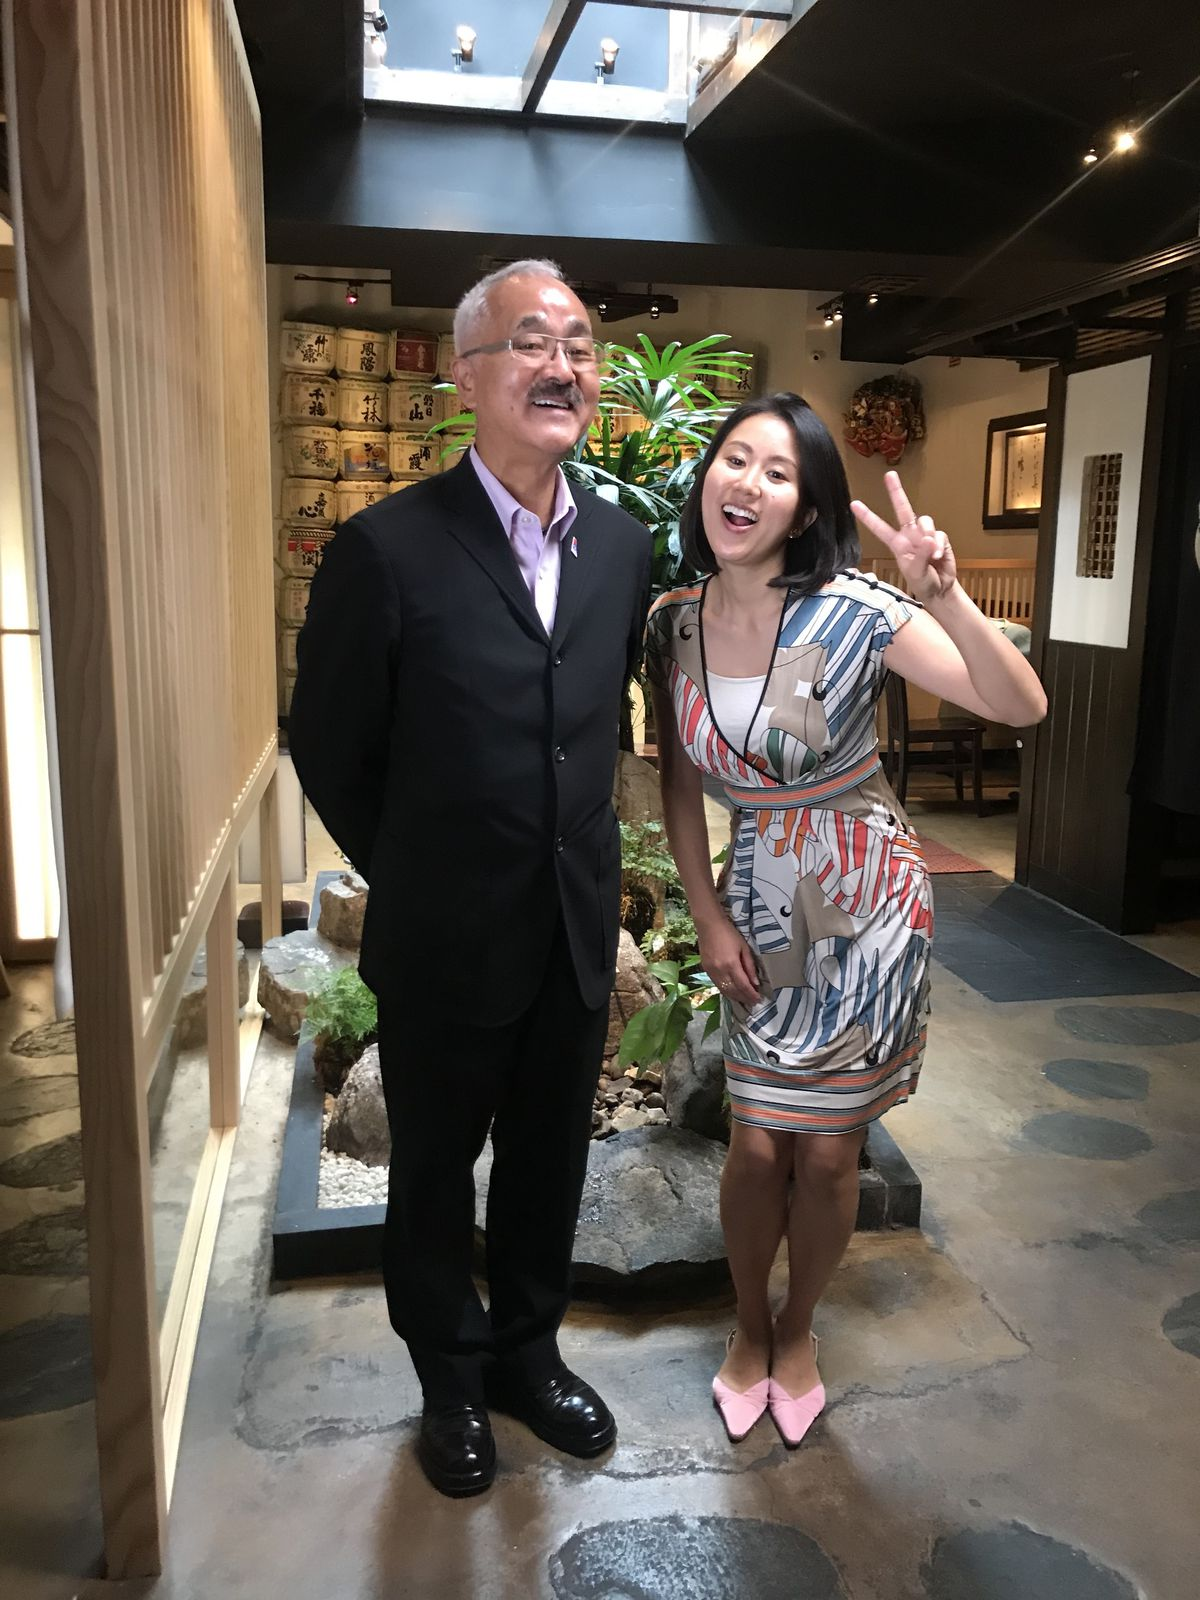 Bon Yagi and Sakura Yagi pose for a photo in front of an indoor Japanese garden